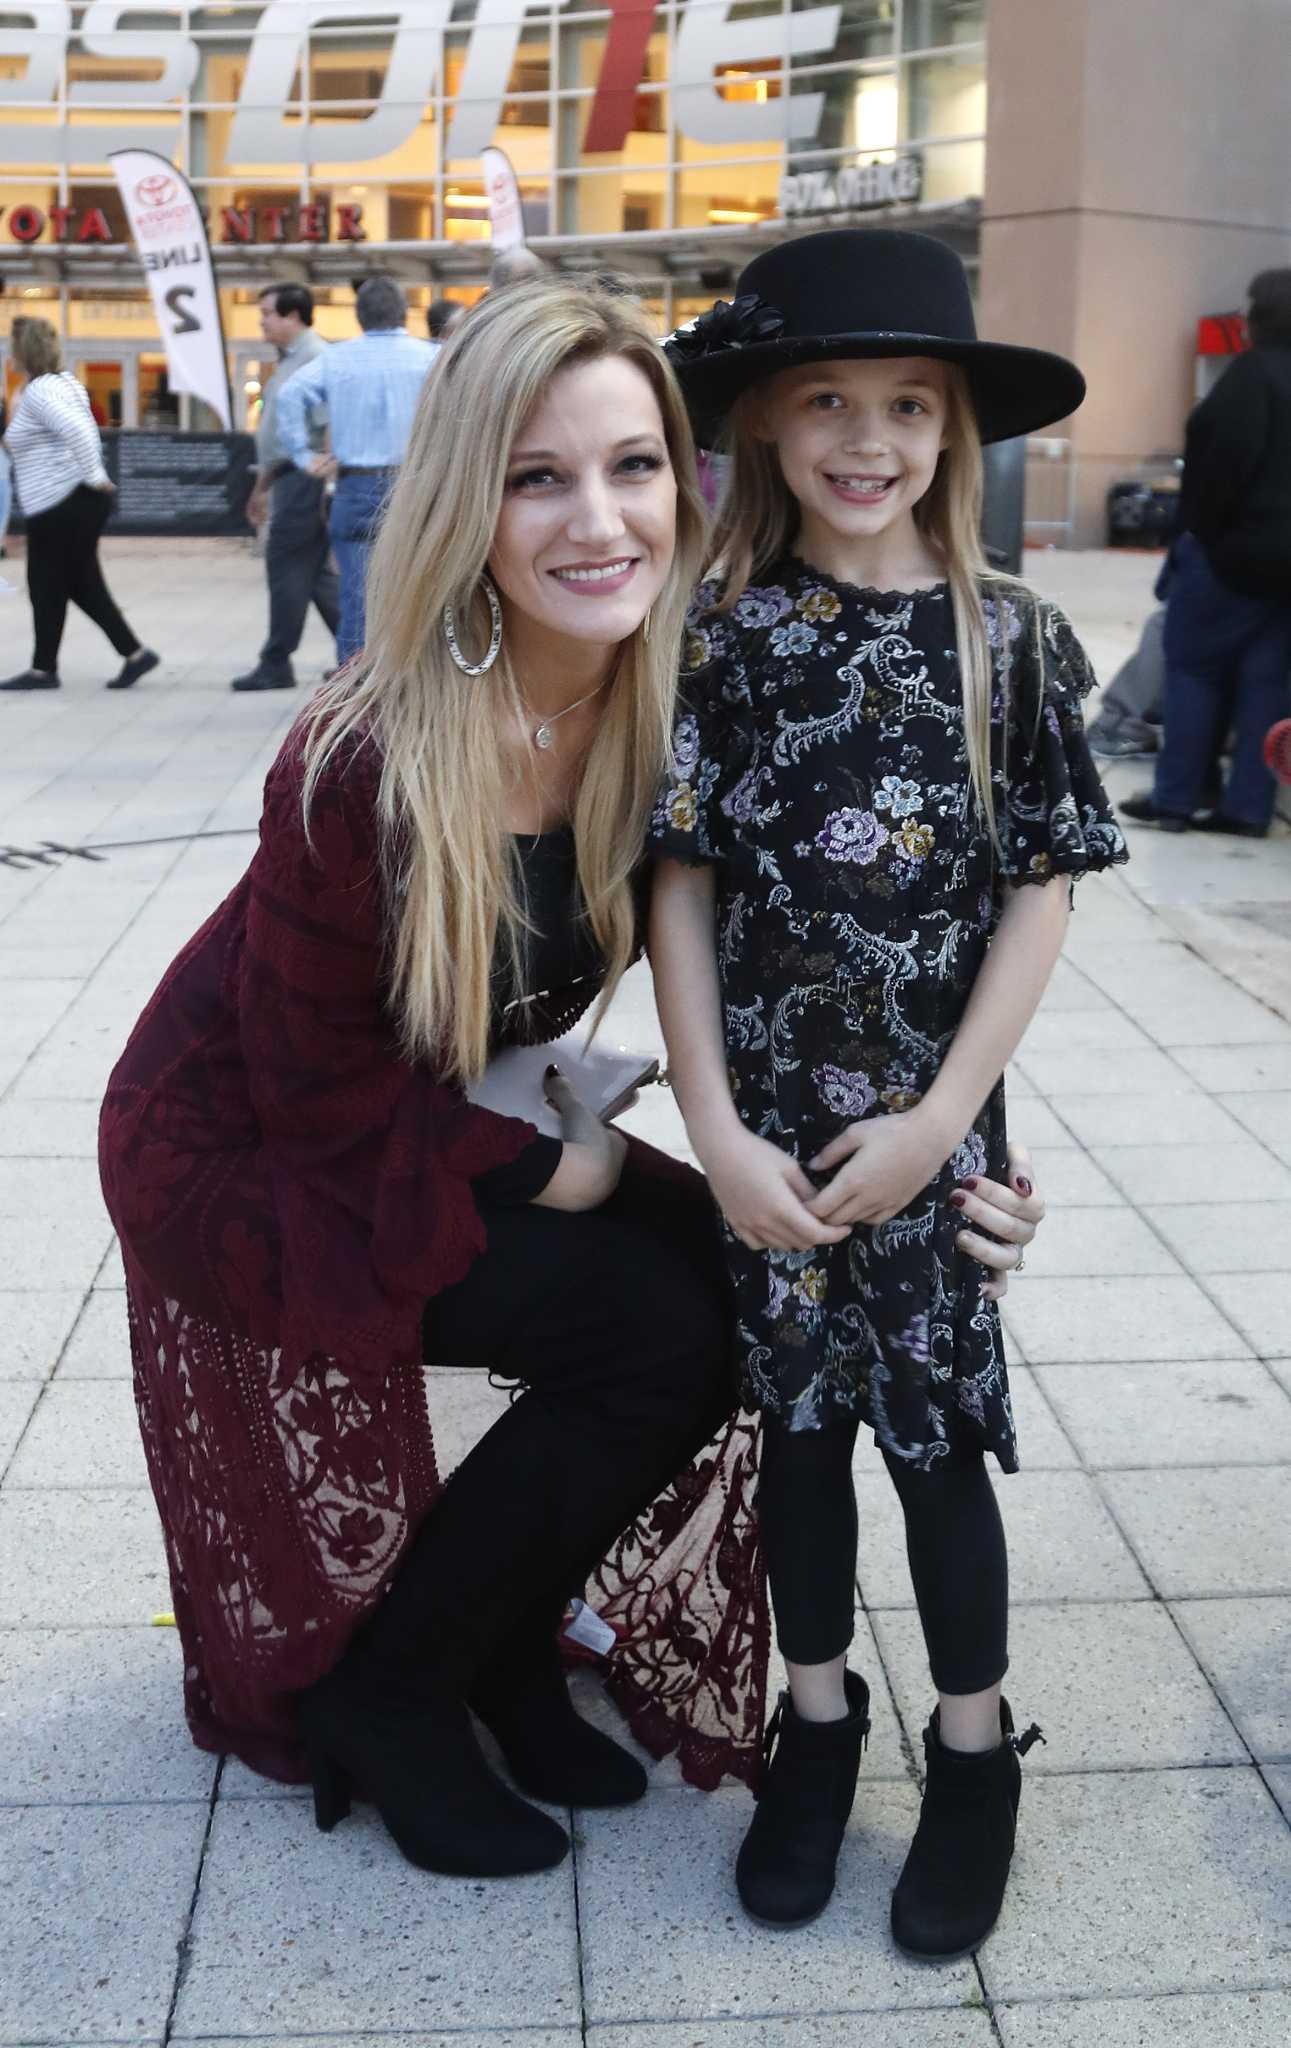 Photos: Fleetwood Mac still casts a spell in Houston